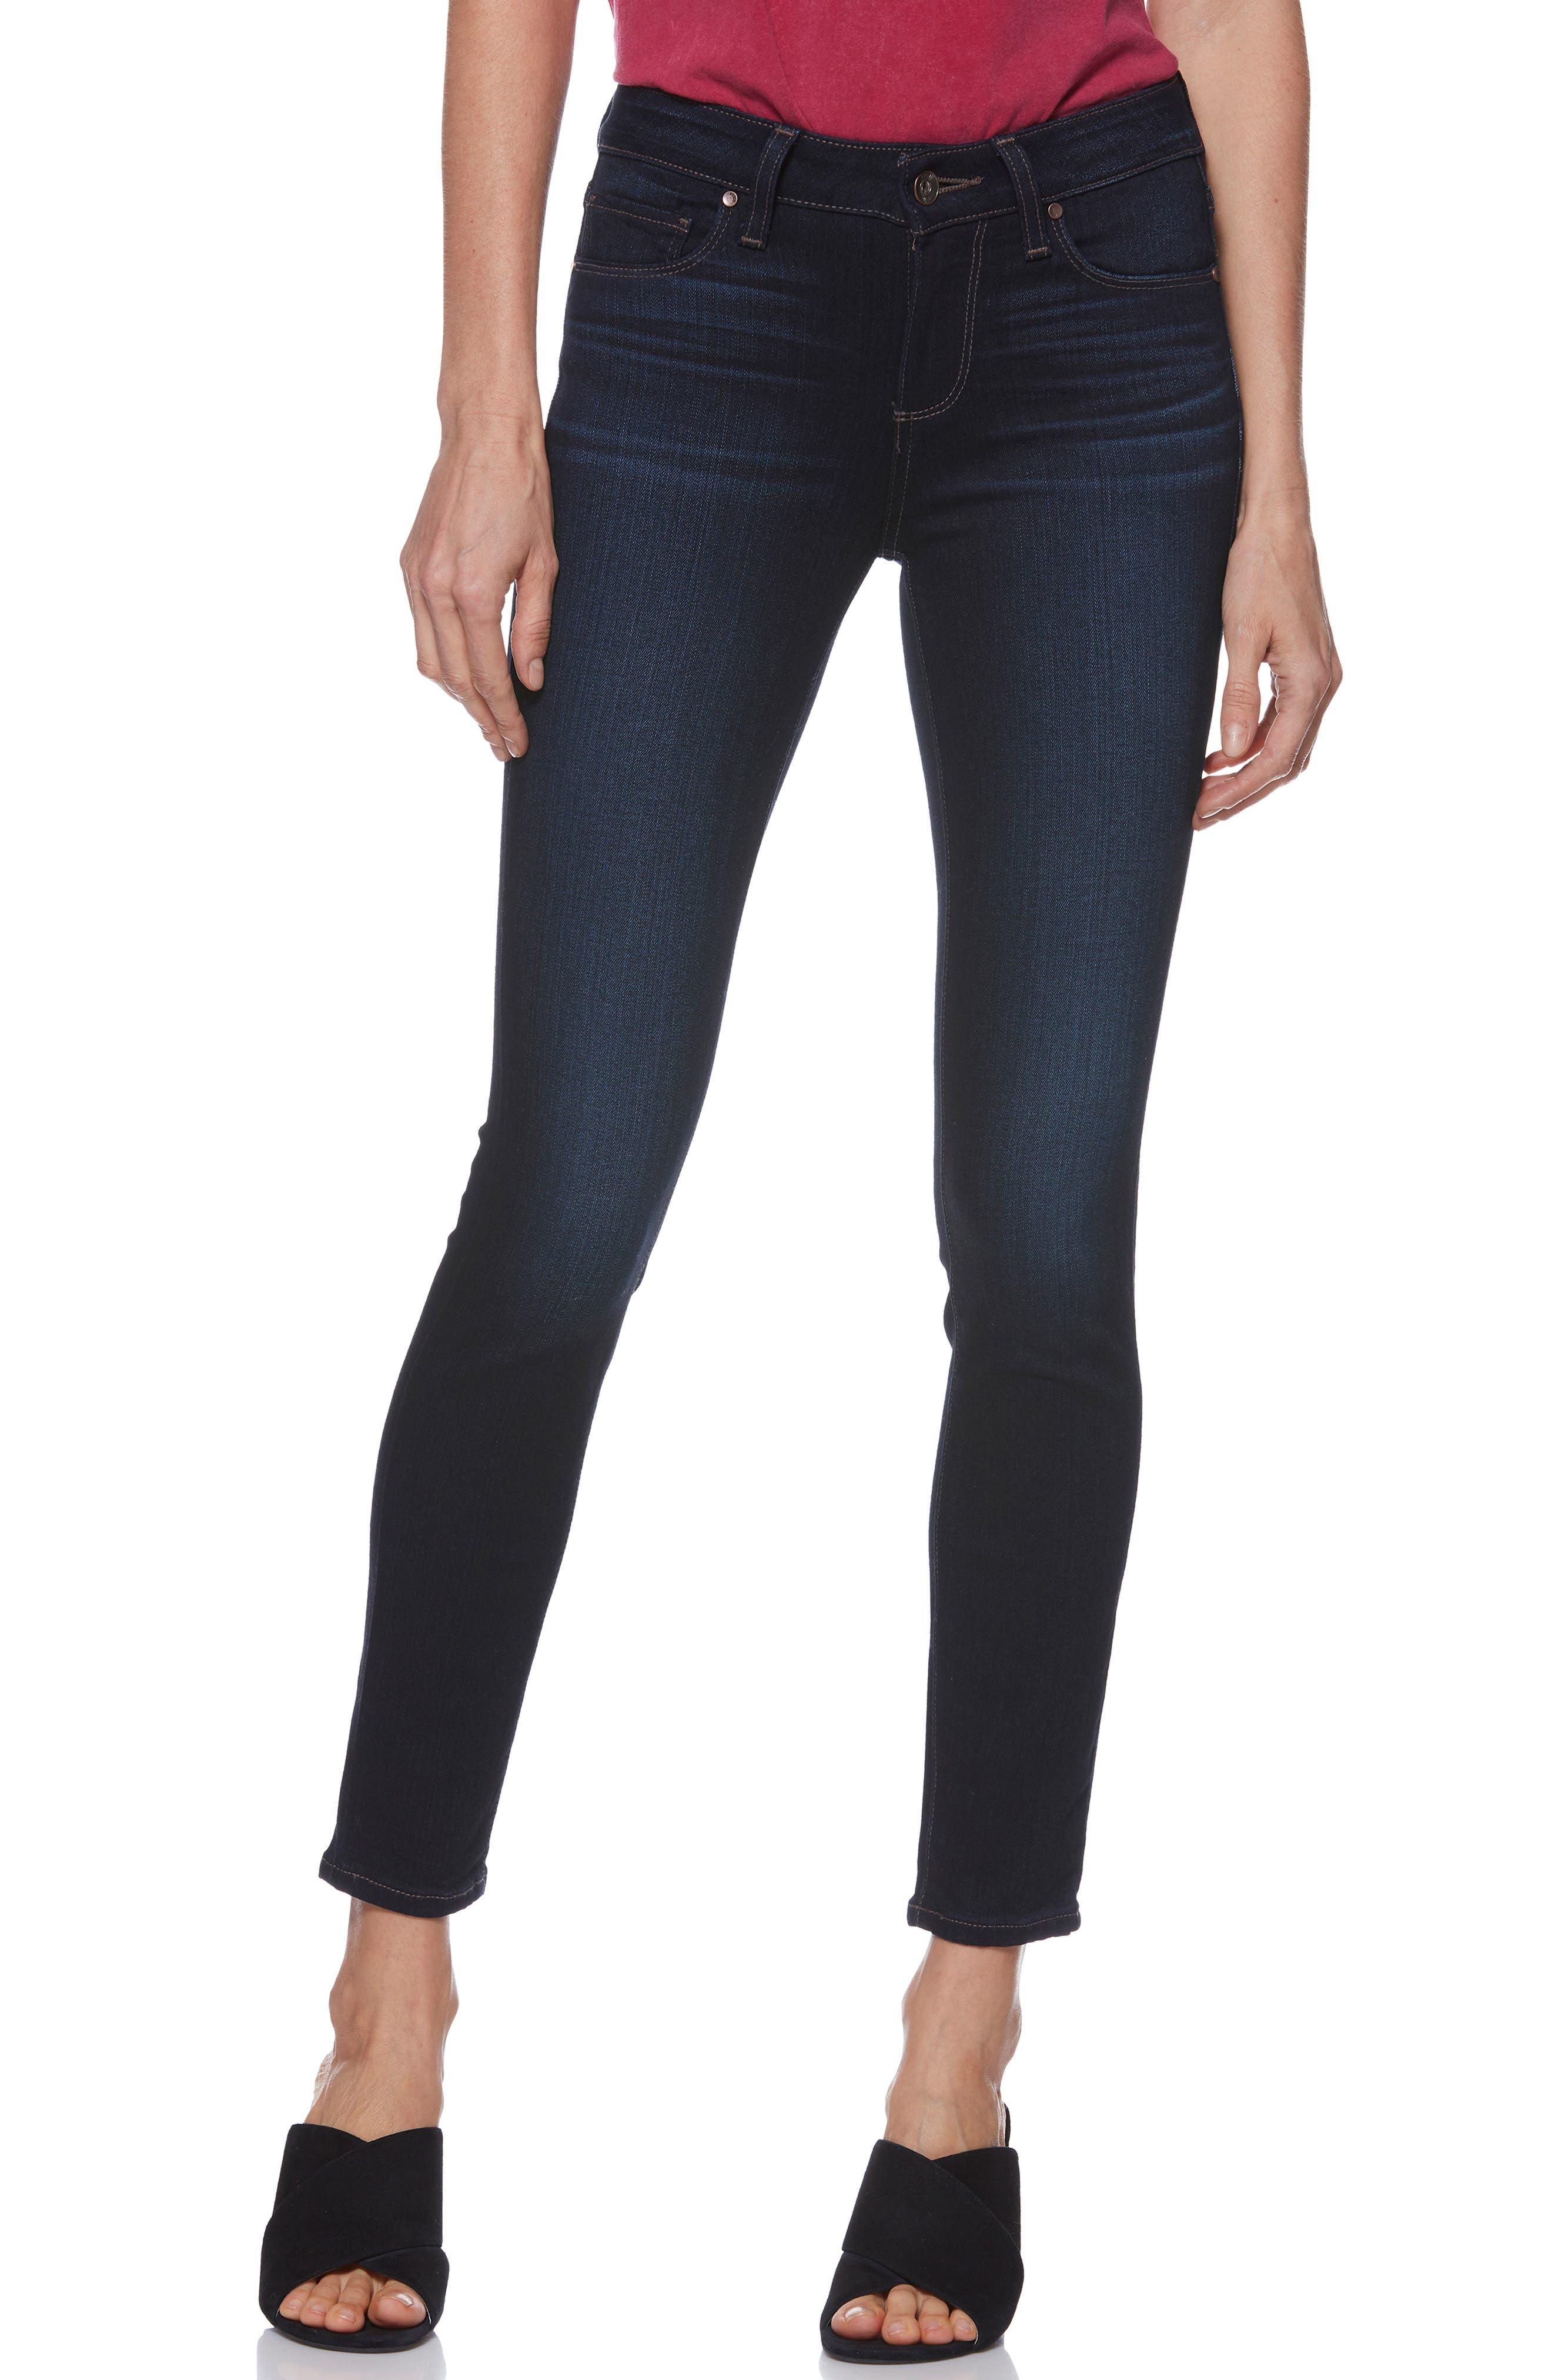 Transcend - Verdugo Ankle Skinny Jeans,                         Main,                         color, 400